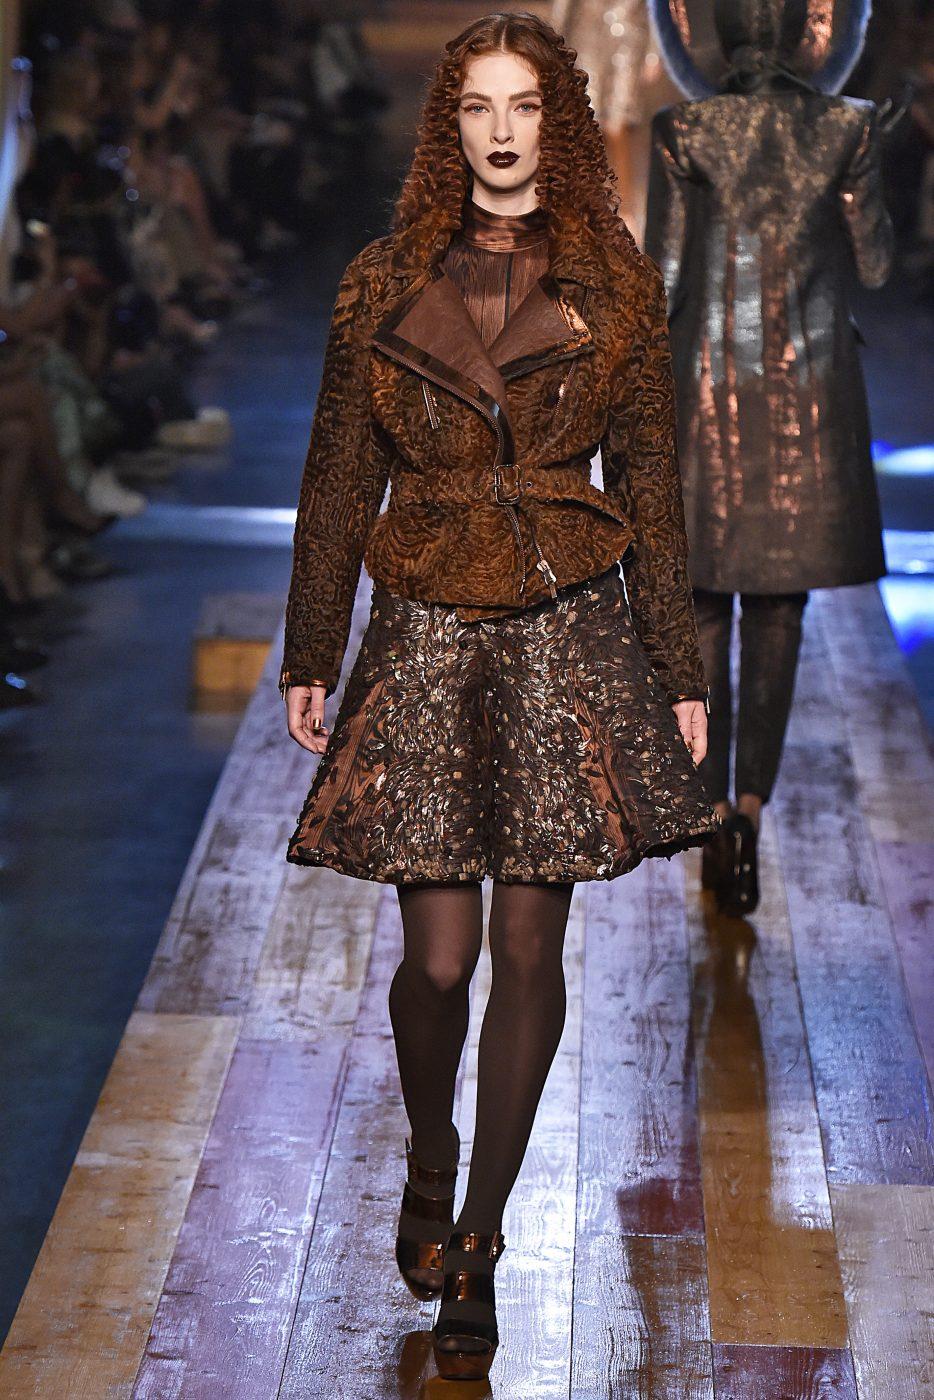 Jean Paul Gaultier Haute Couture Fall Winter 2016